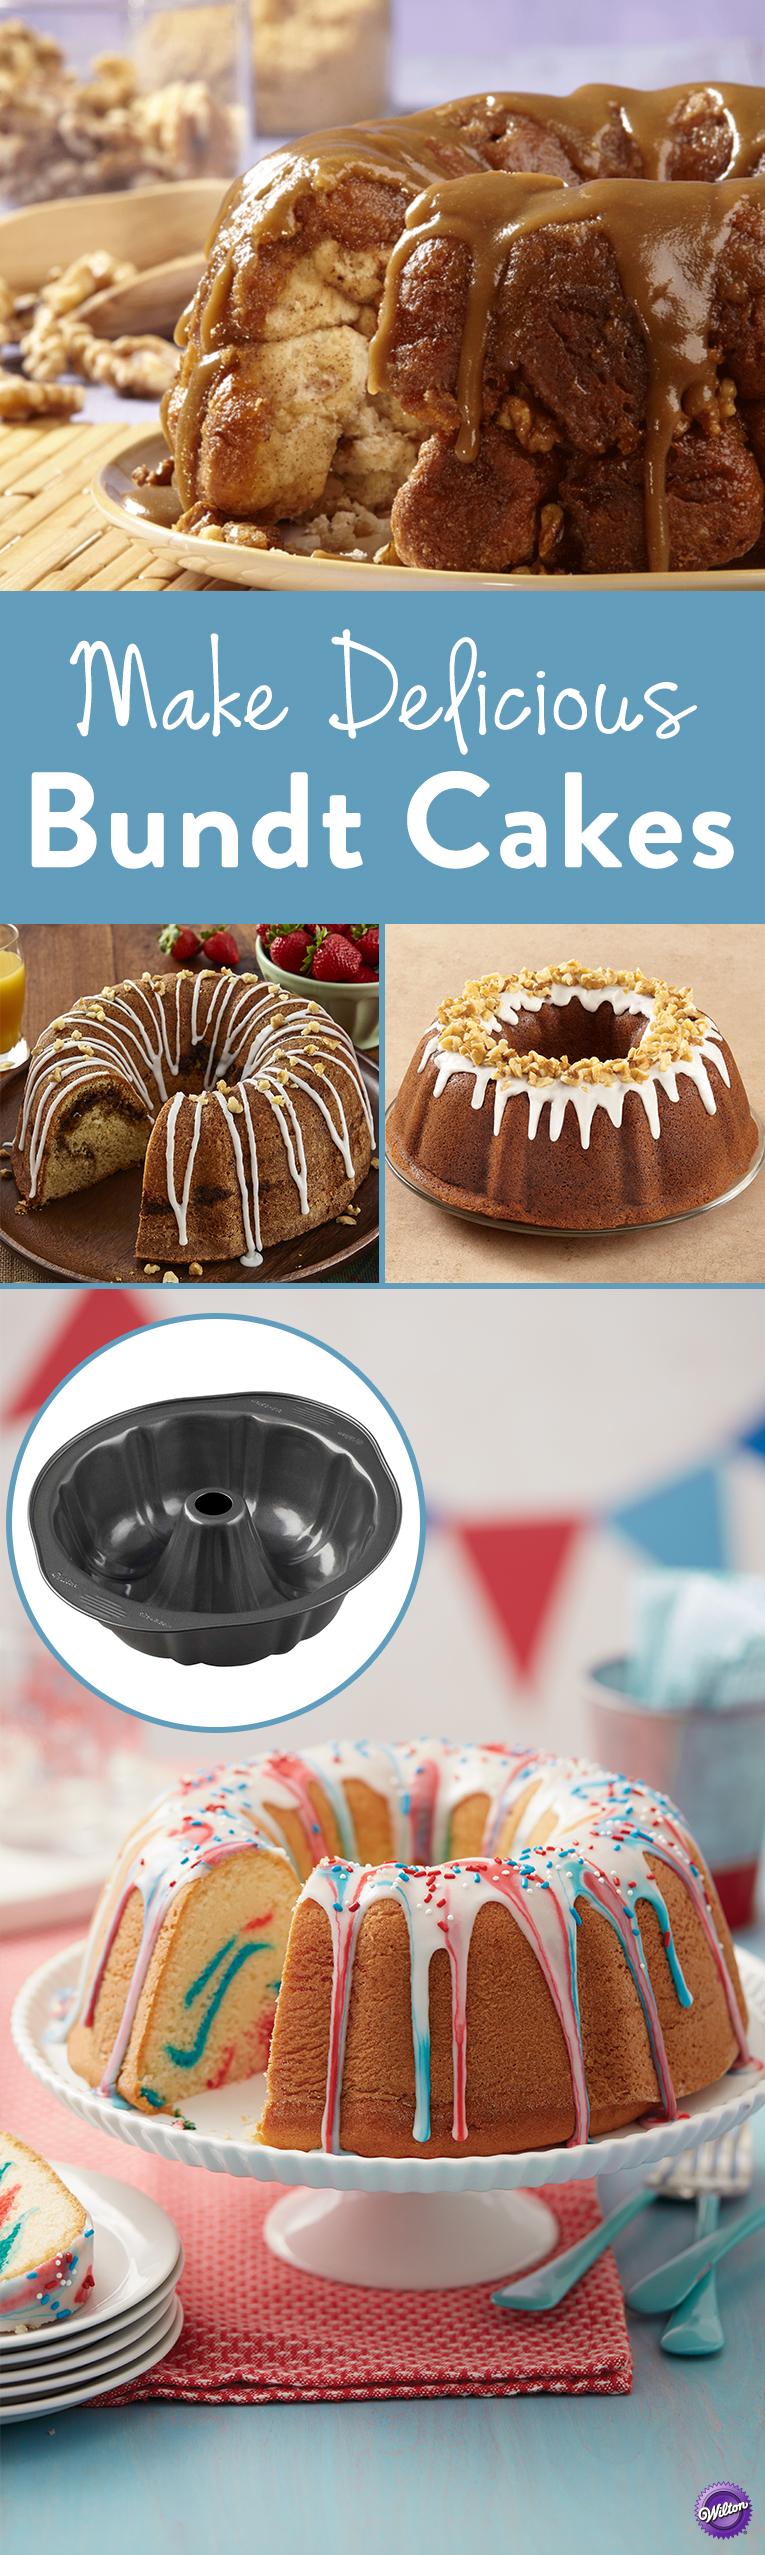 Make delicious bundt cakes bake delicious bundt cakes